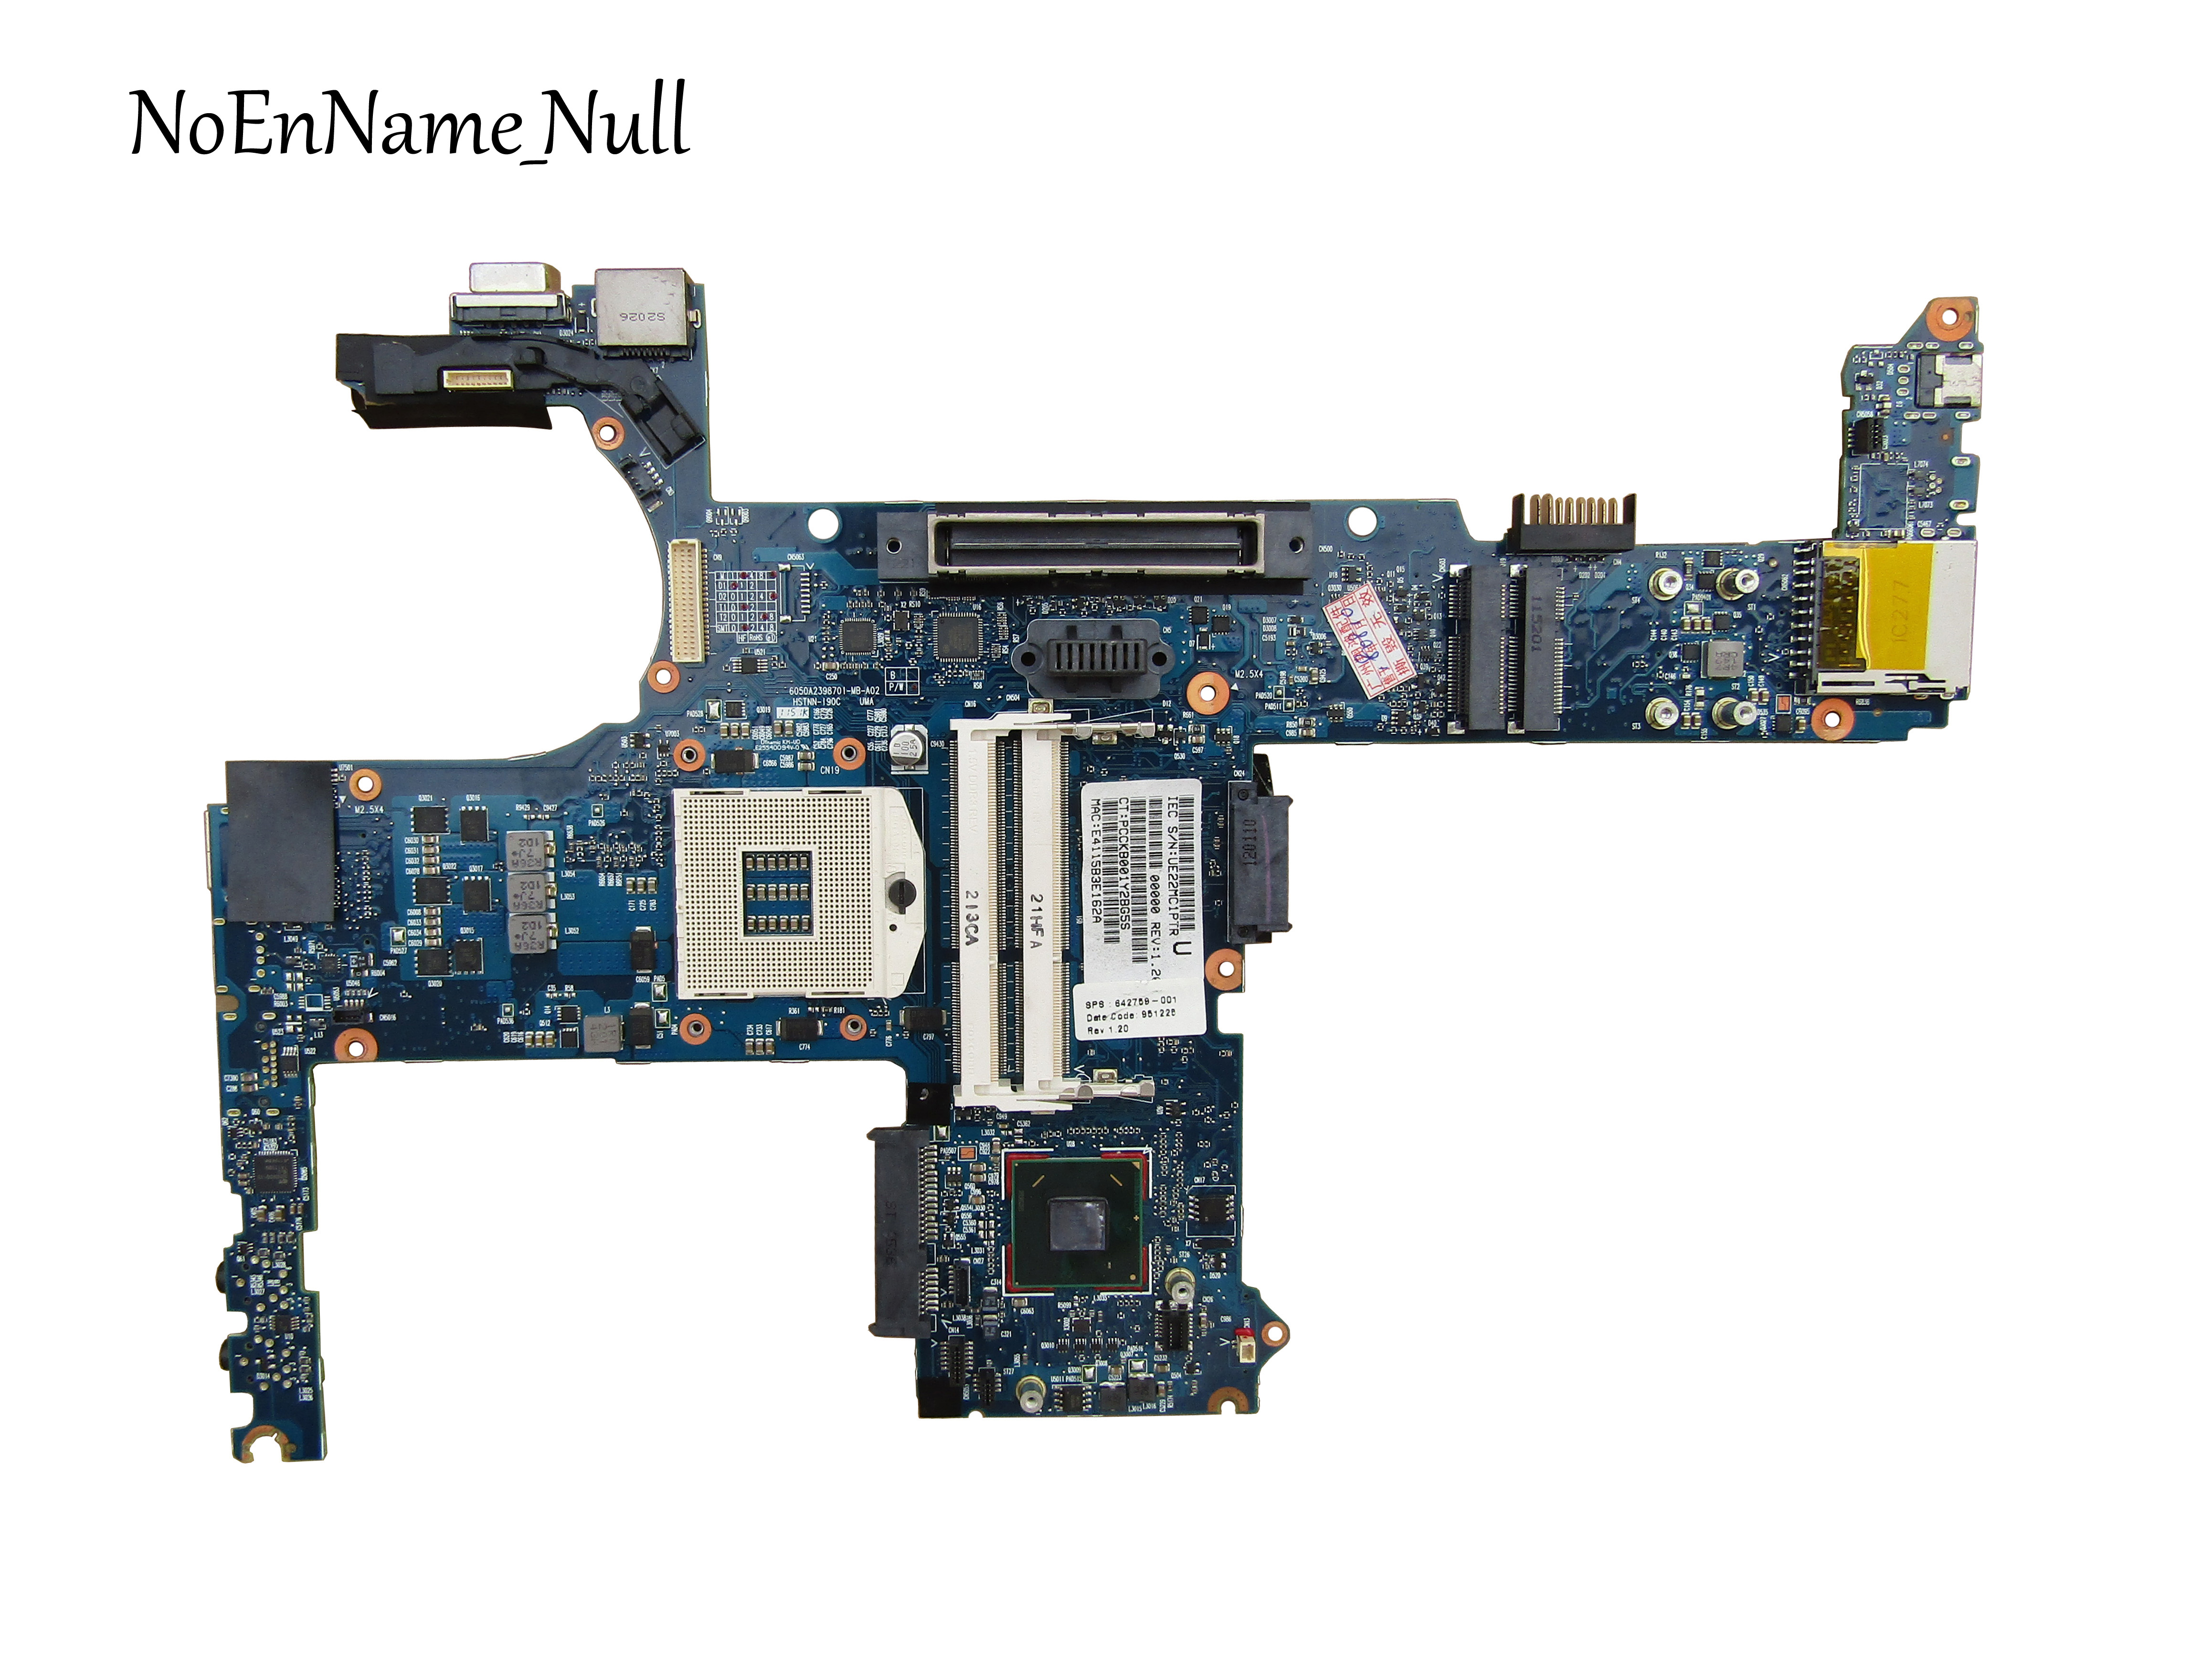 642759-001 para HP EliteBook 8460p Notebook para HP 8460P laptop motherboard Intel para QM67 chipset 100% completo testado ok